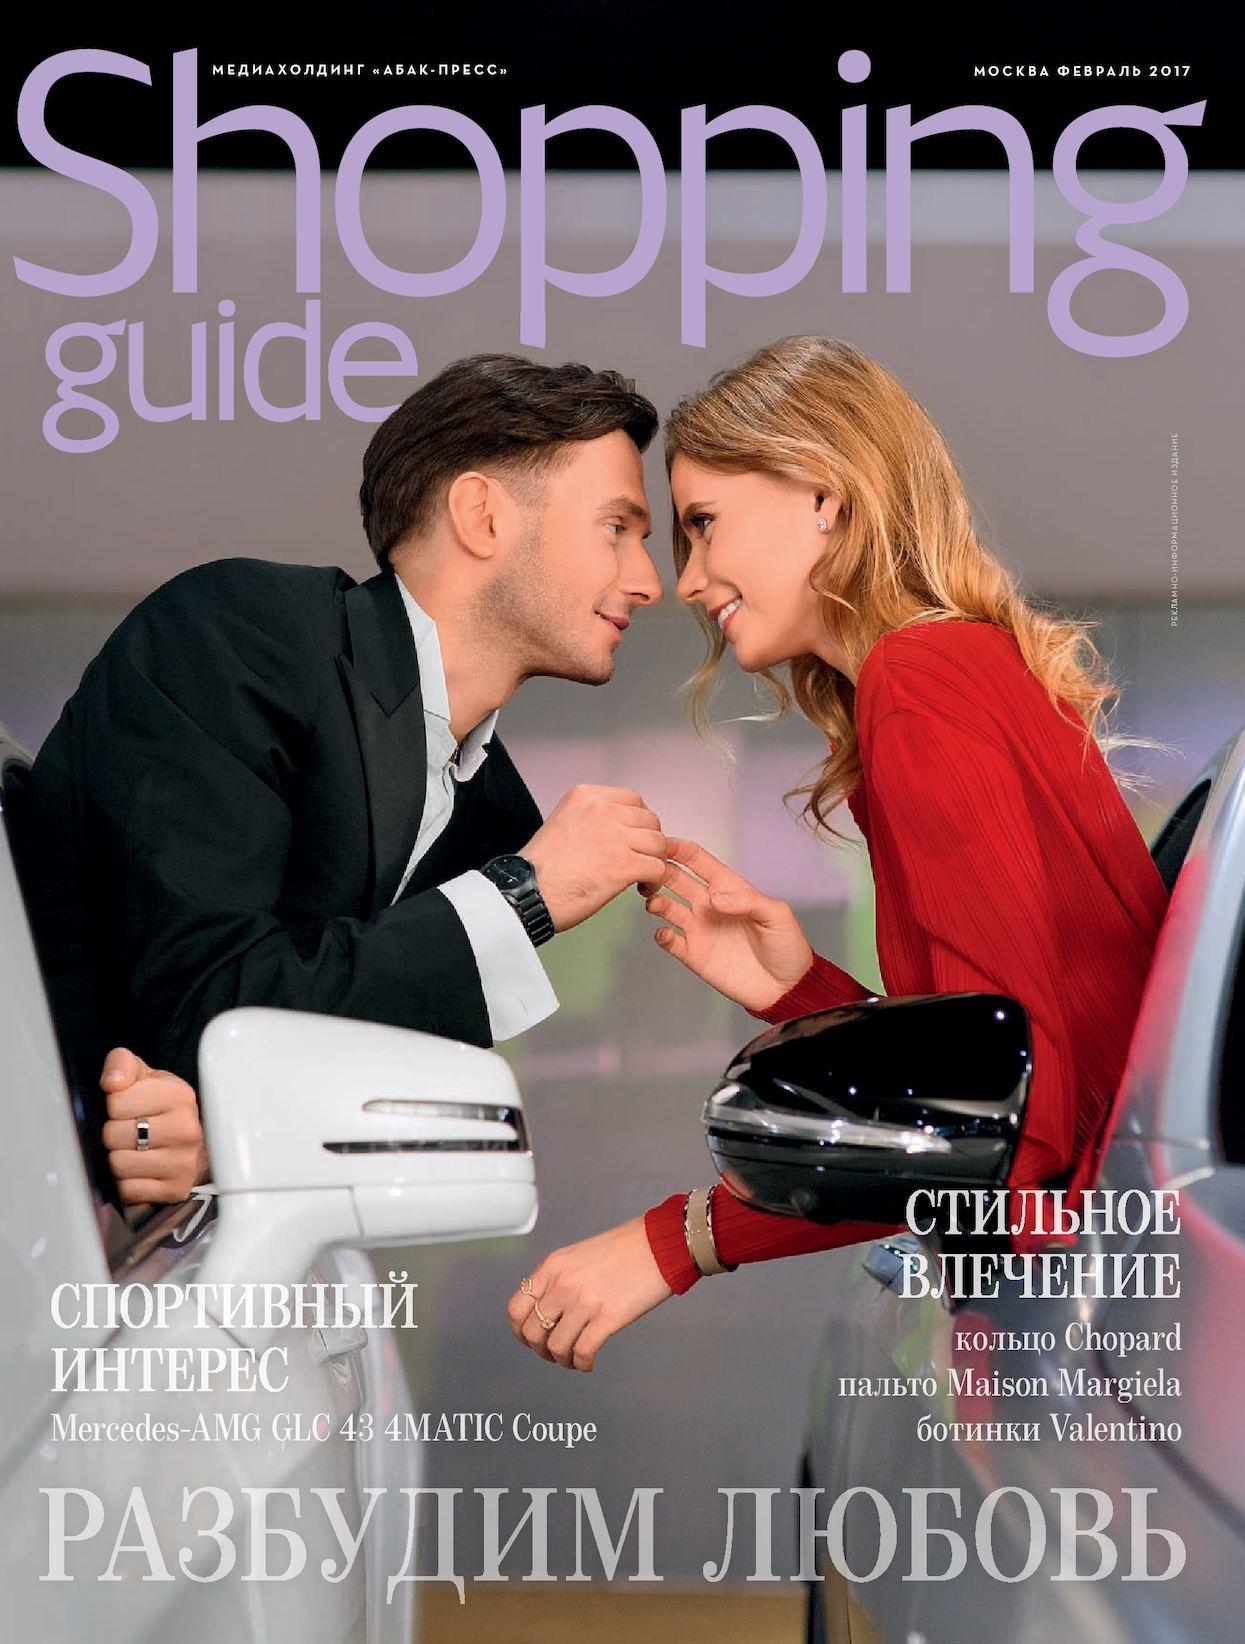 c04dbe446f1 Calaméo - ShoppingGuide 02 2017 г. Москва